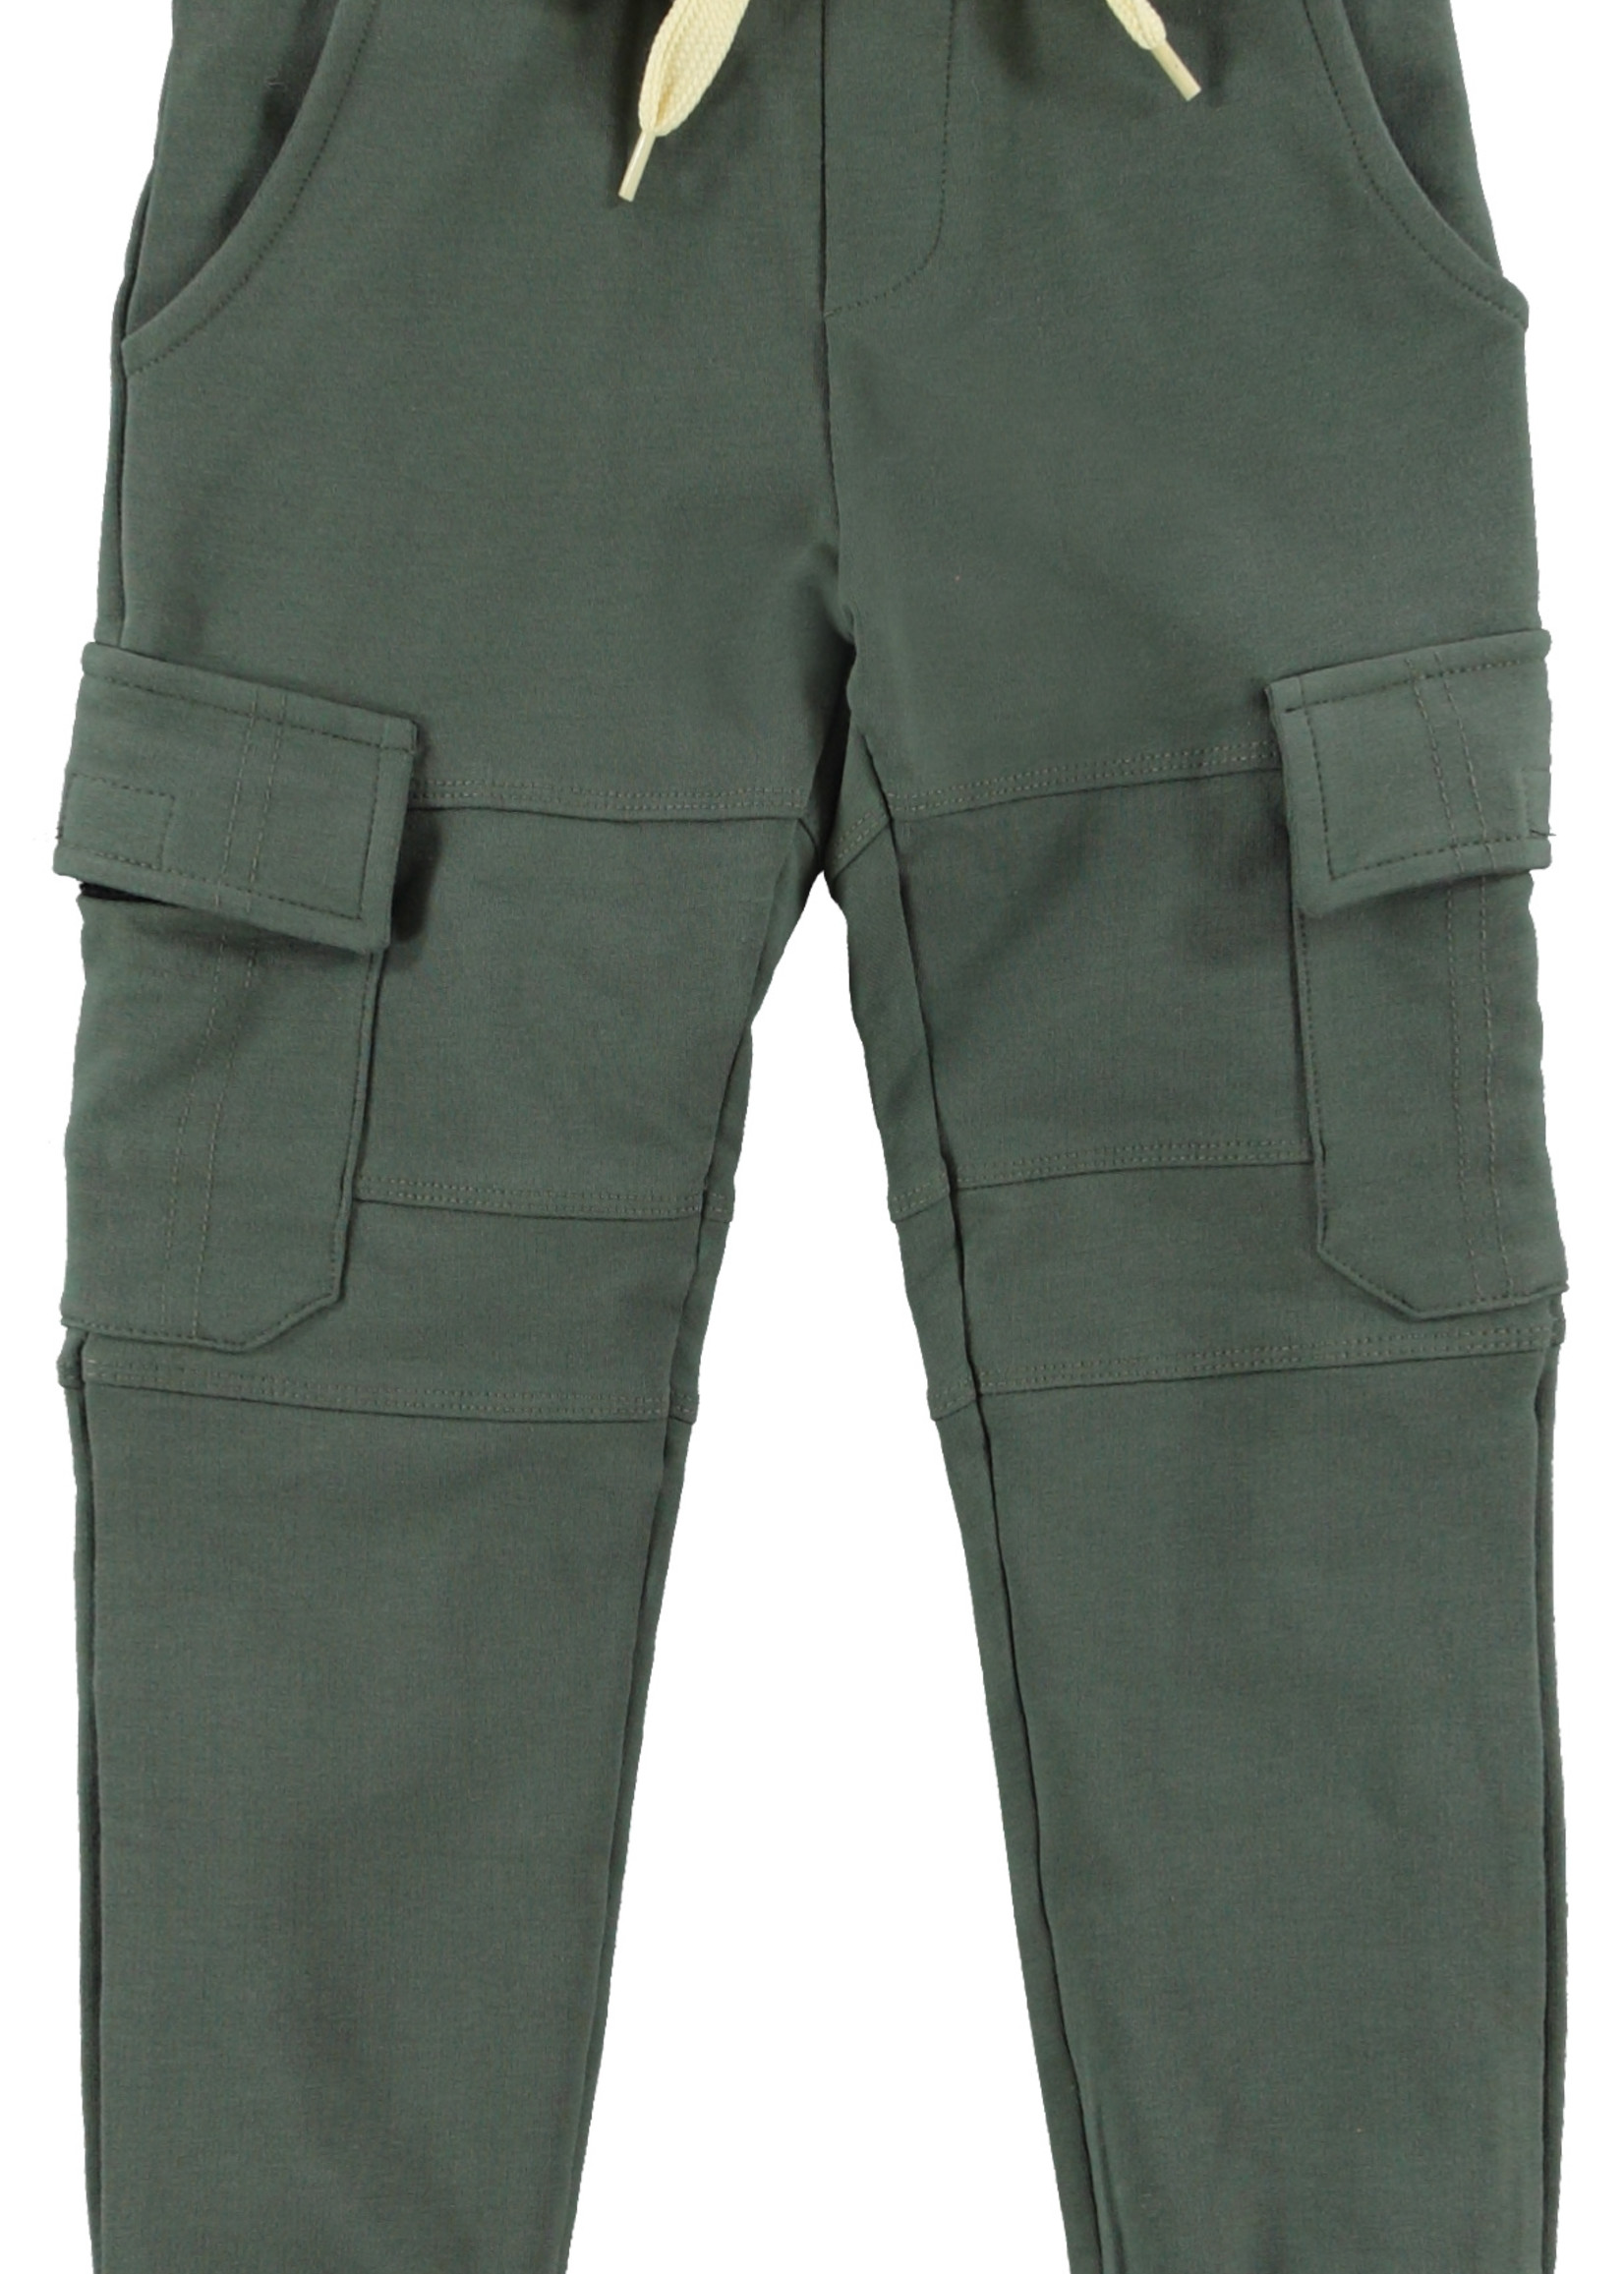 B'chill Gordon trouser